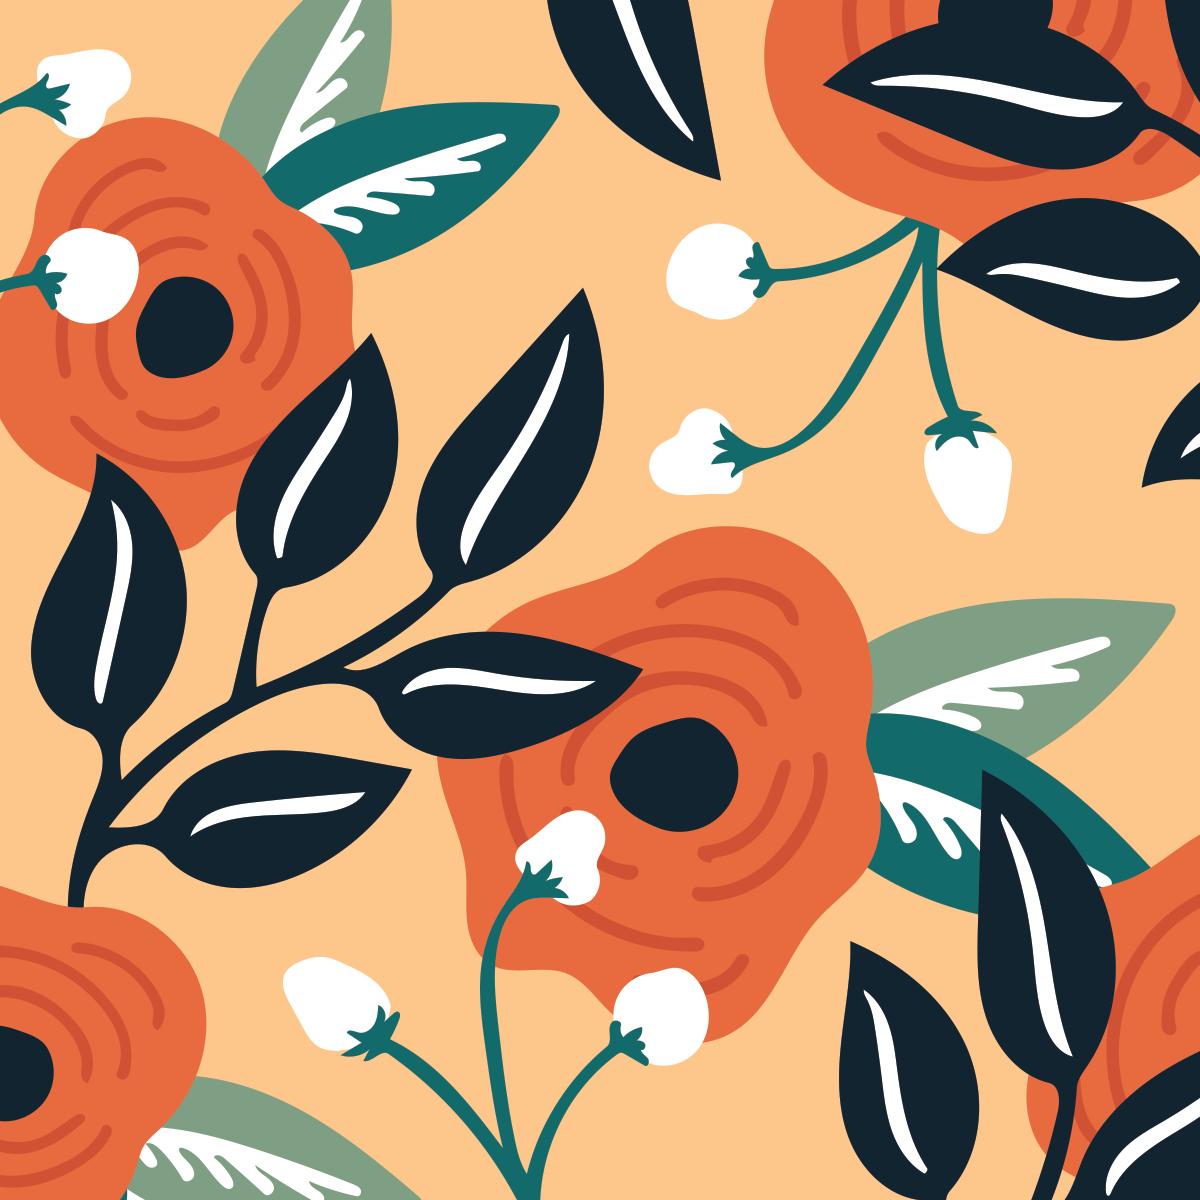 Botanical pattern by Pace Creative Design Studio